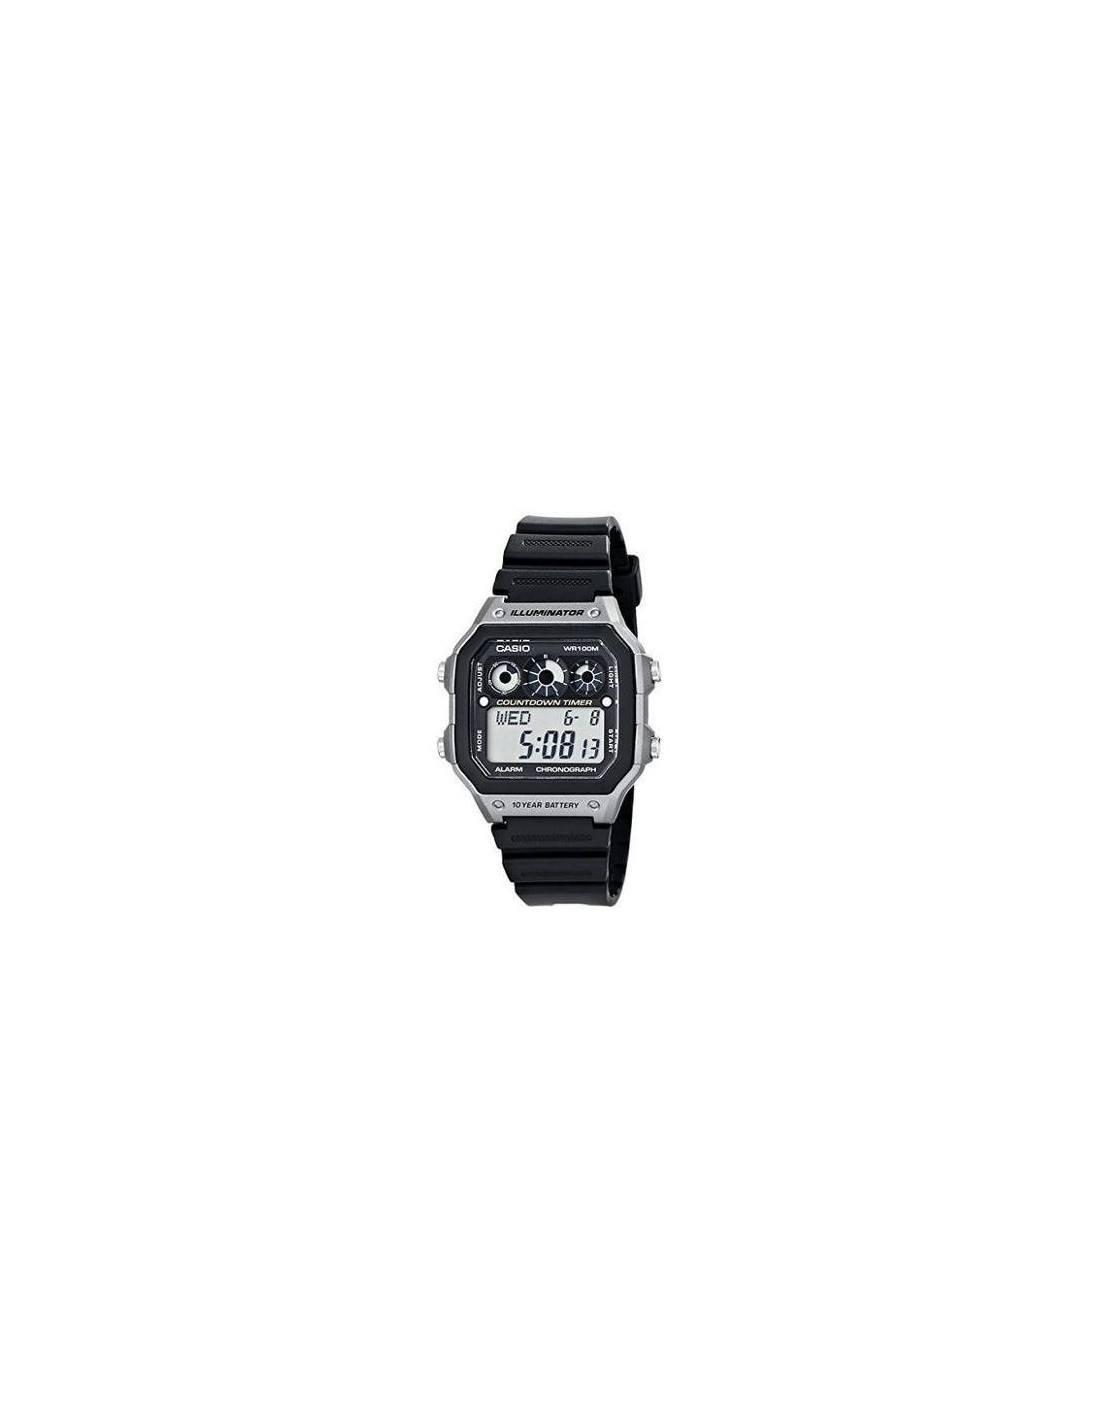 Casio Reloj Para Hombre Ae 1300wh 8avcf Pantalla Digital